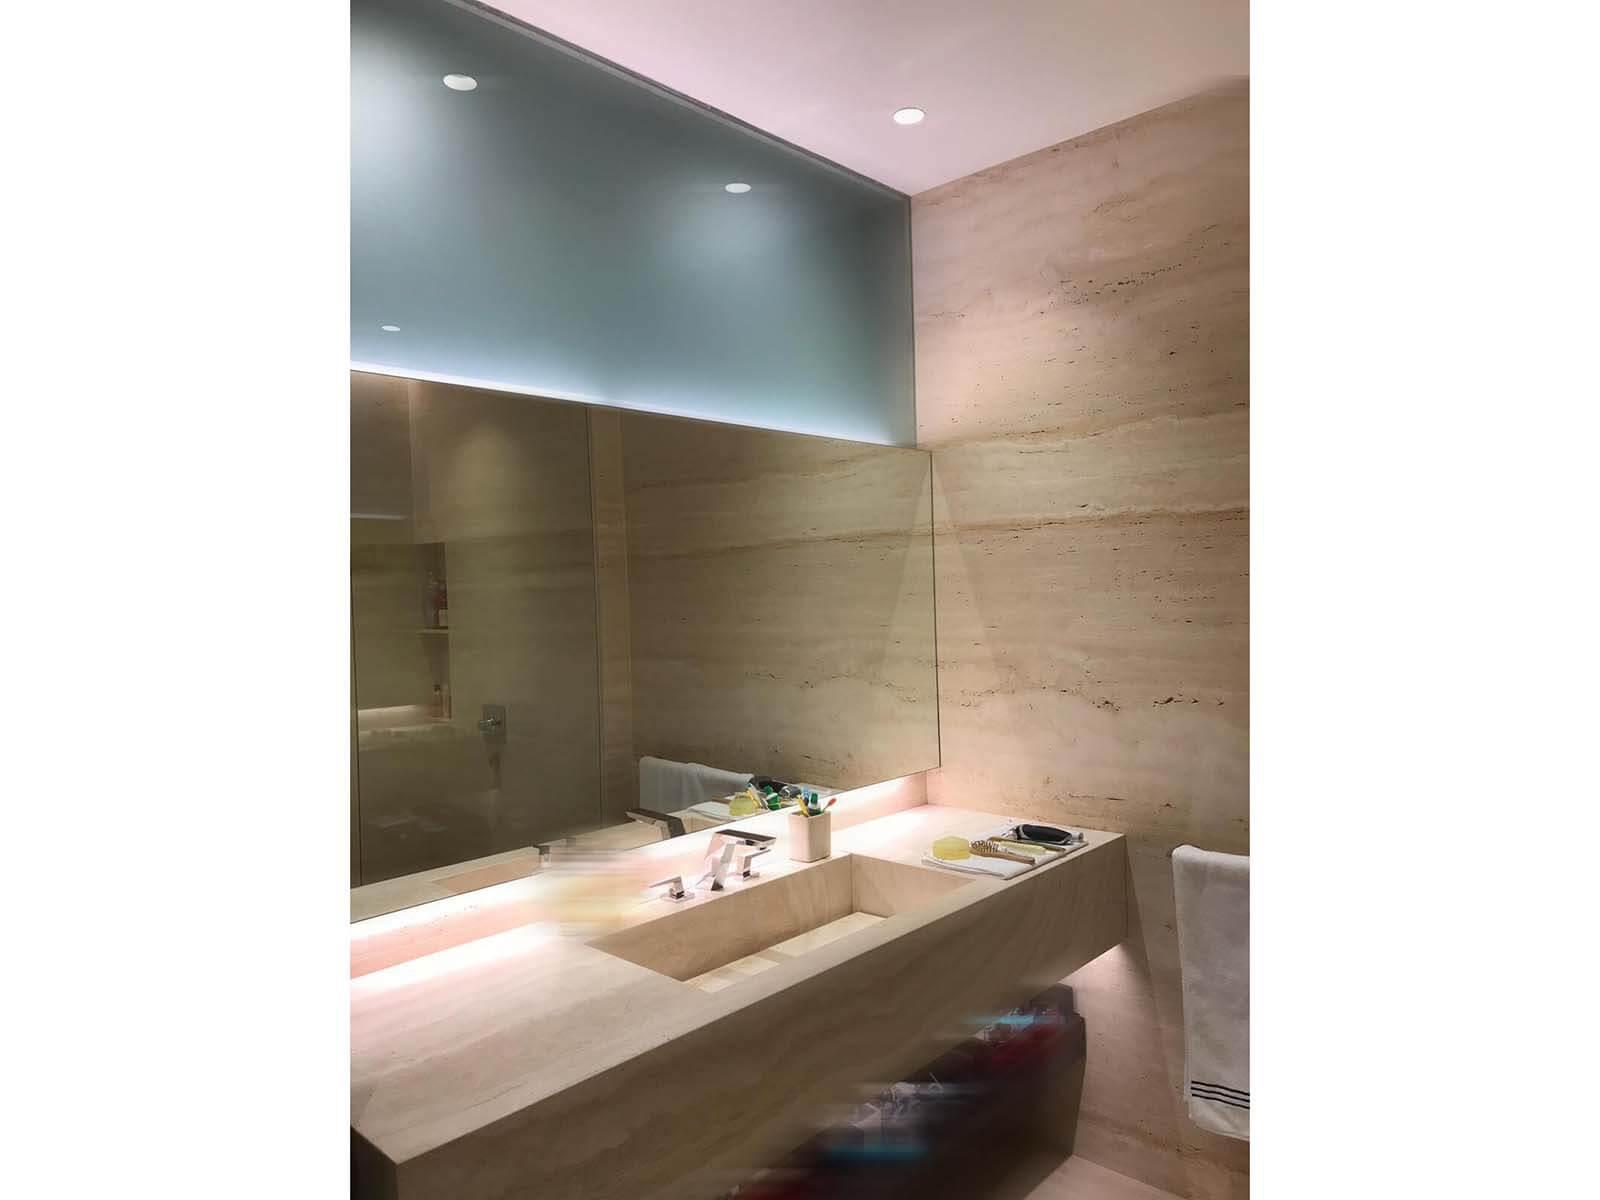 7A Swettenham ham Residential bathroom interior